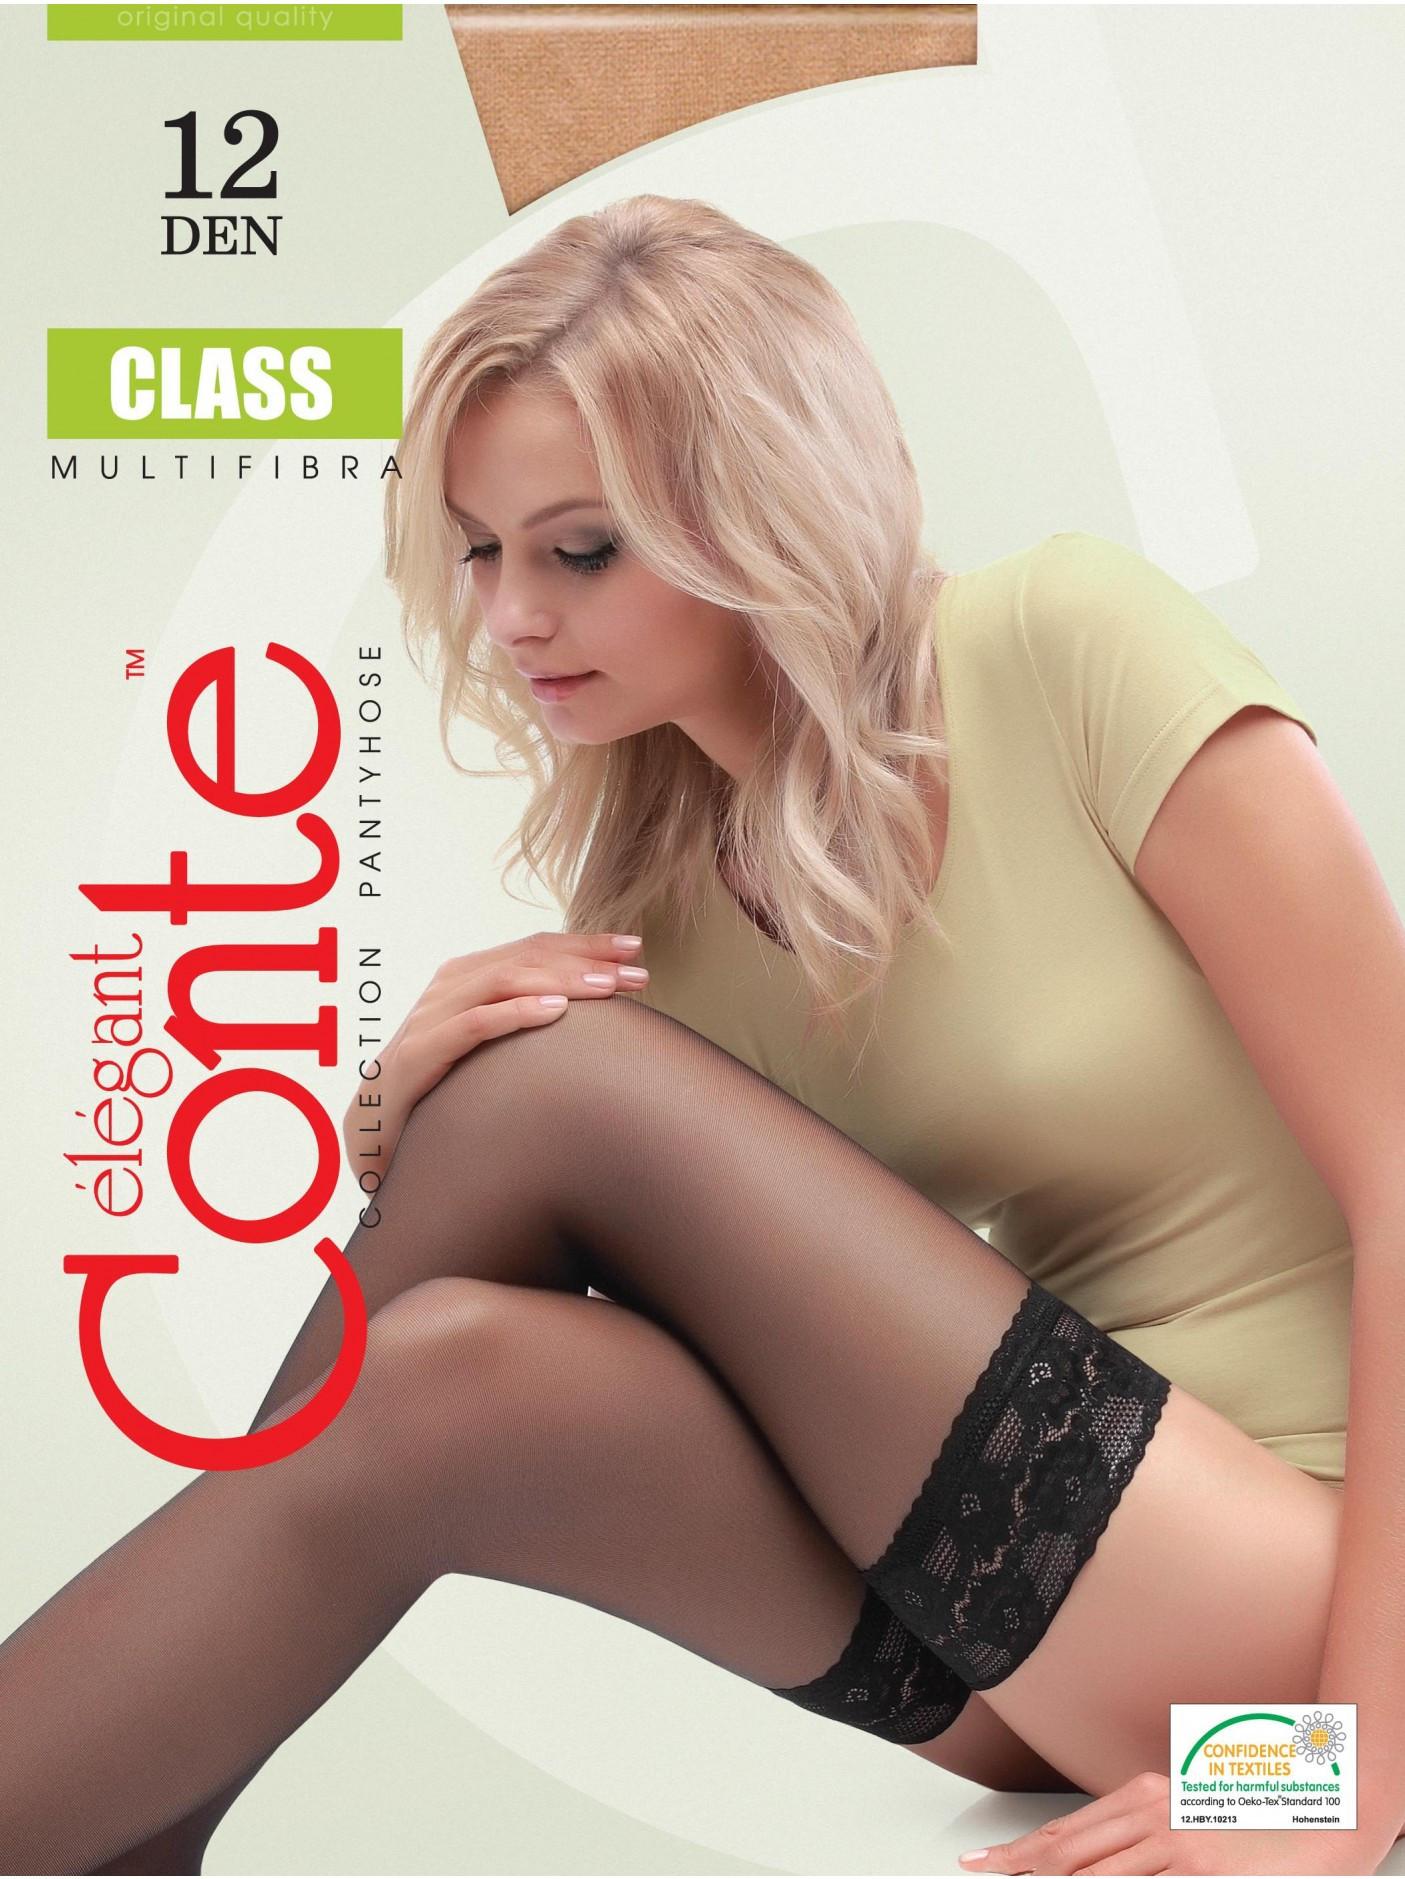 https://golden-legs.com.ua/images/stories/virtuemart/product/11476-ponczochy-damskie-class-12den-conte.jpg